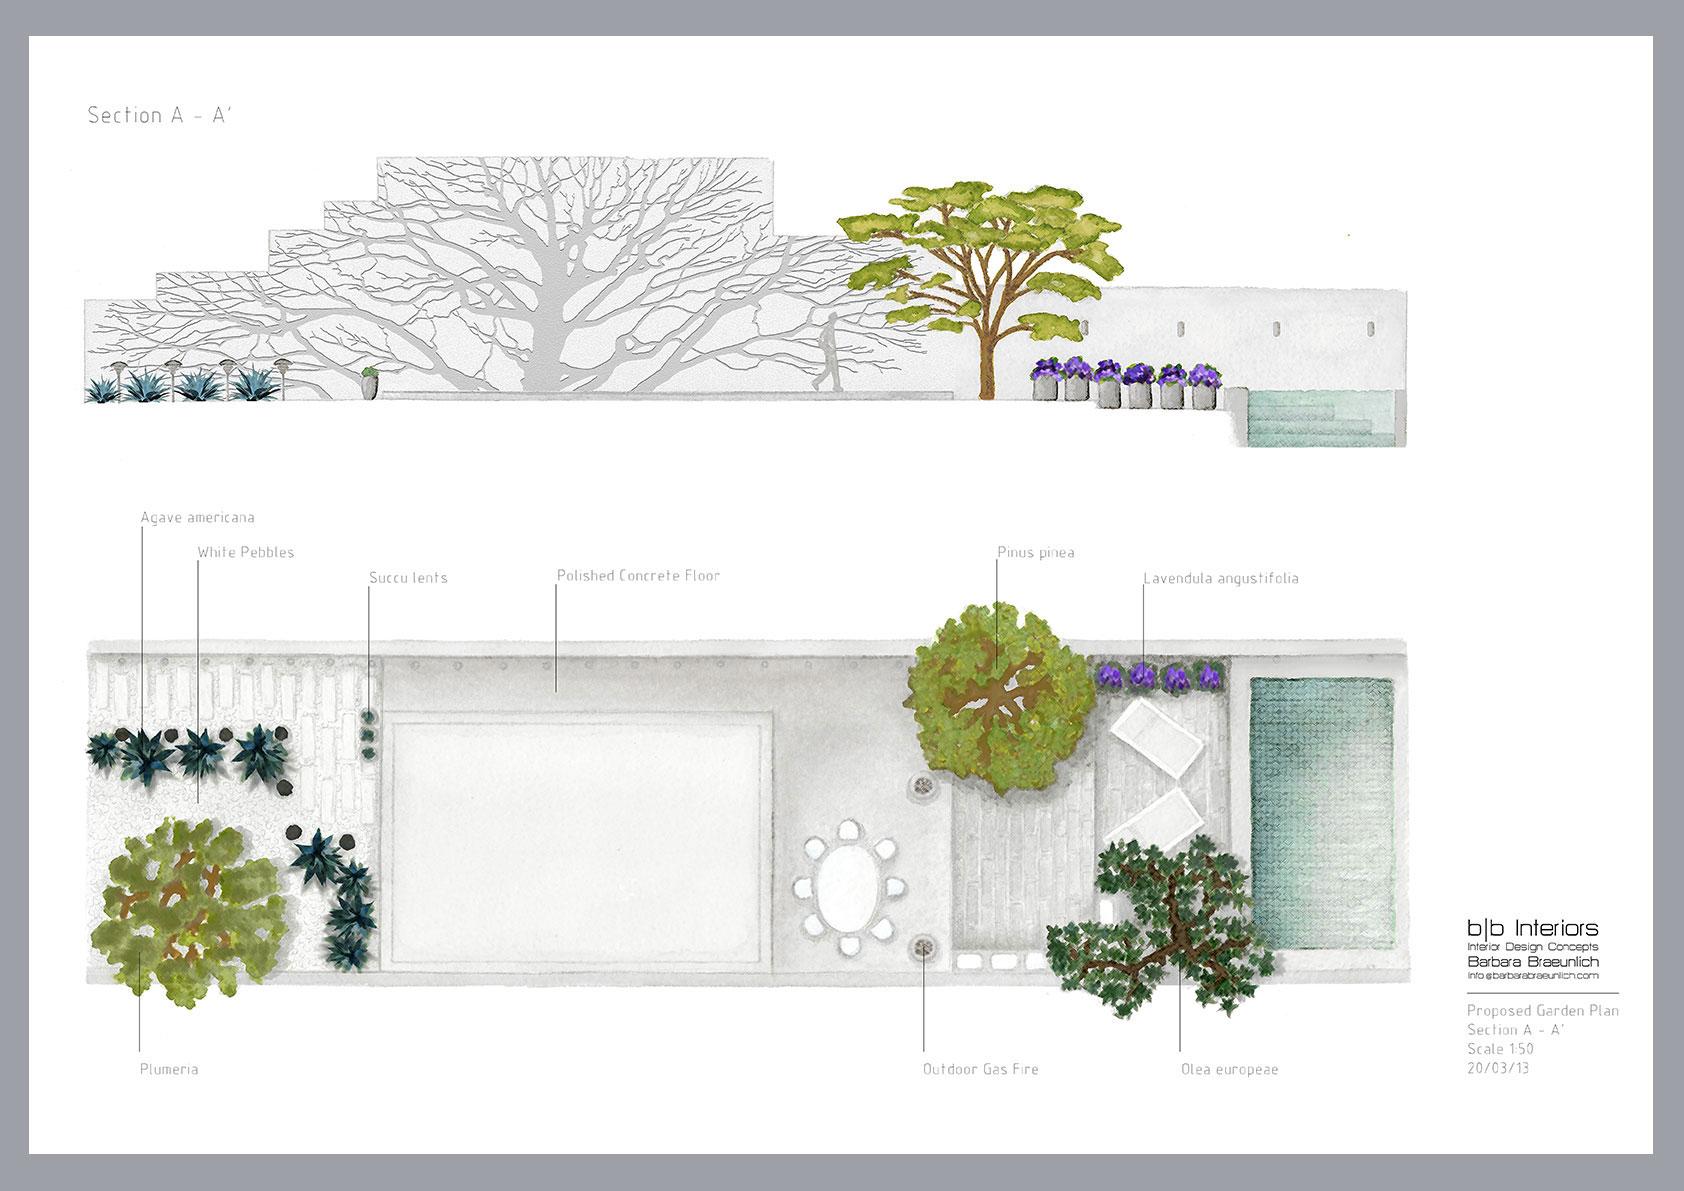 Garden Plan by Barbara Braeunlich, Student at JJAADA